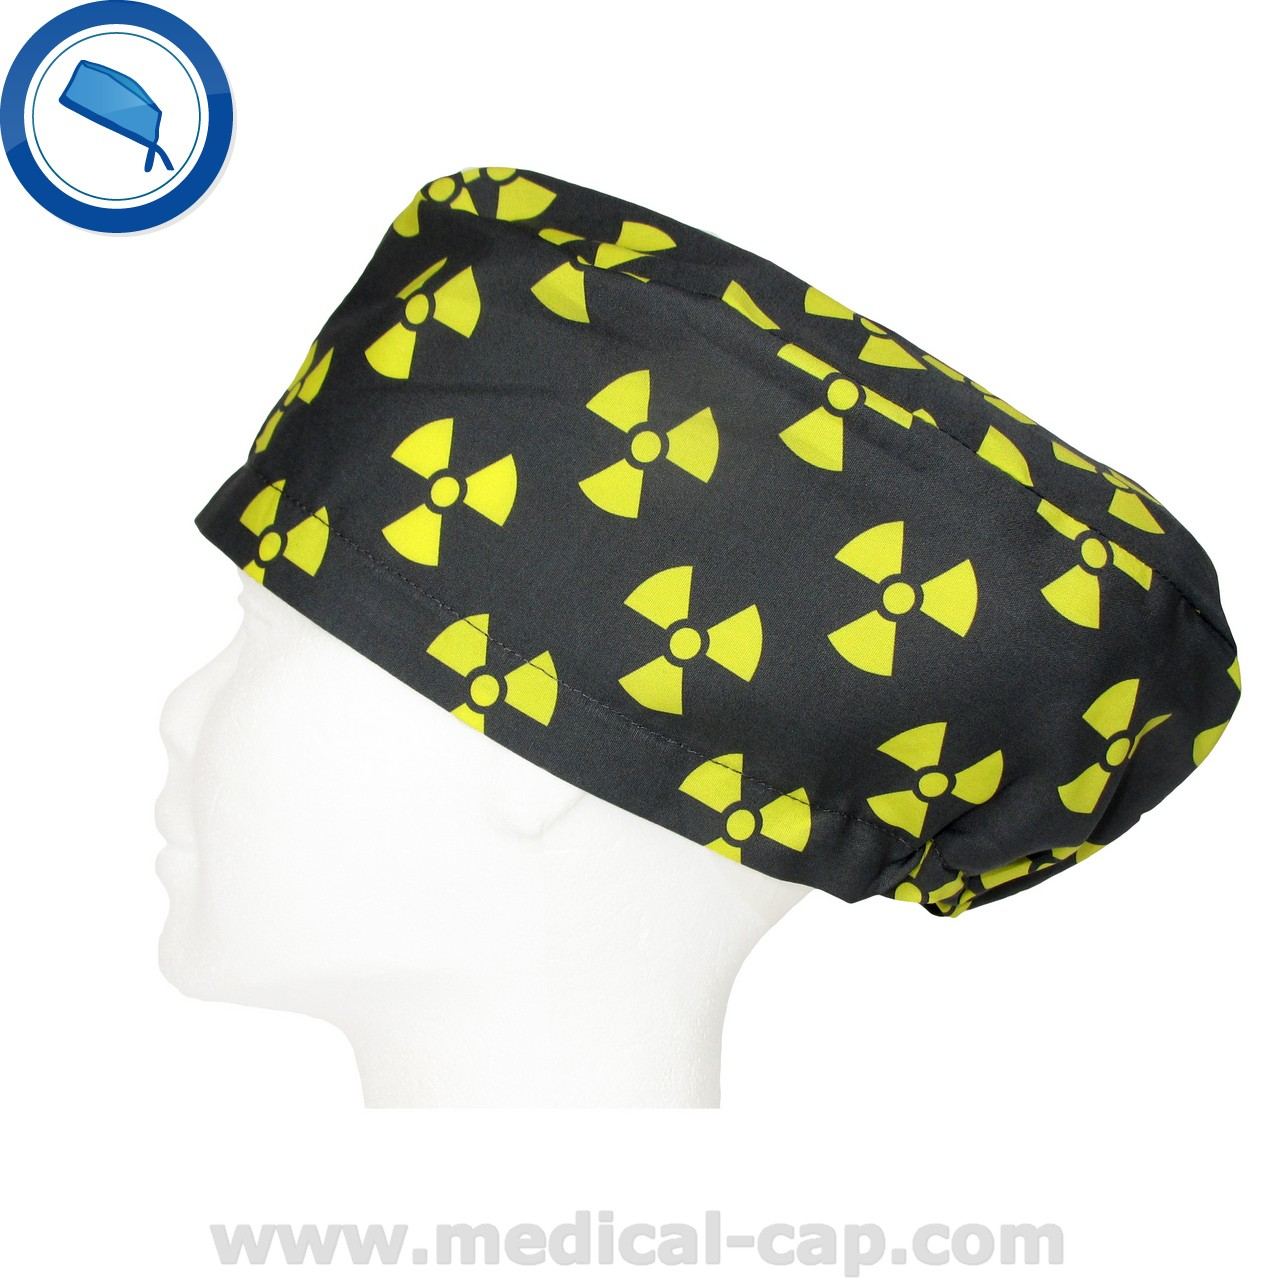 c2fc0613542 Radiologists Cap Radiation symbol black